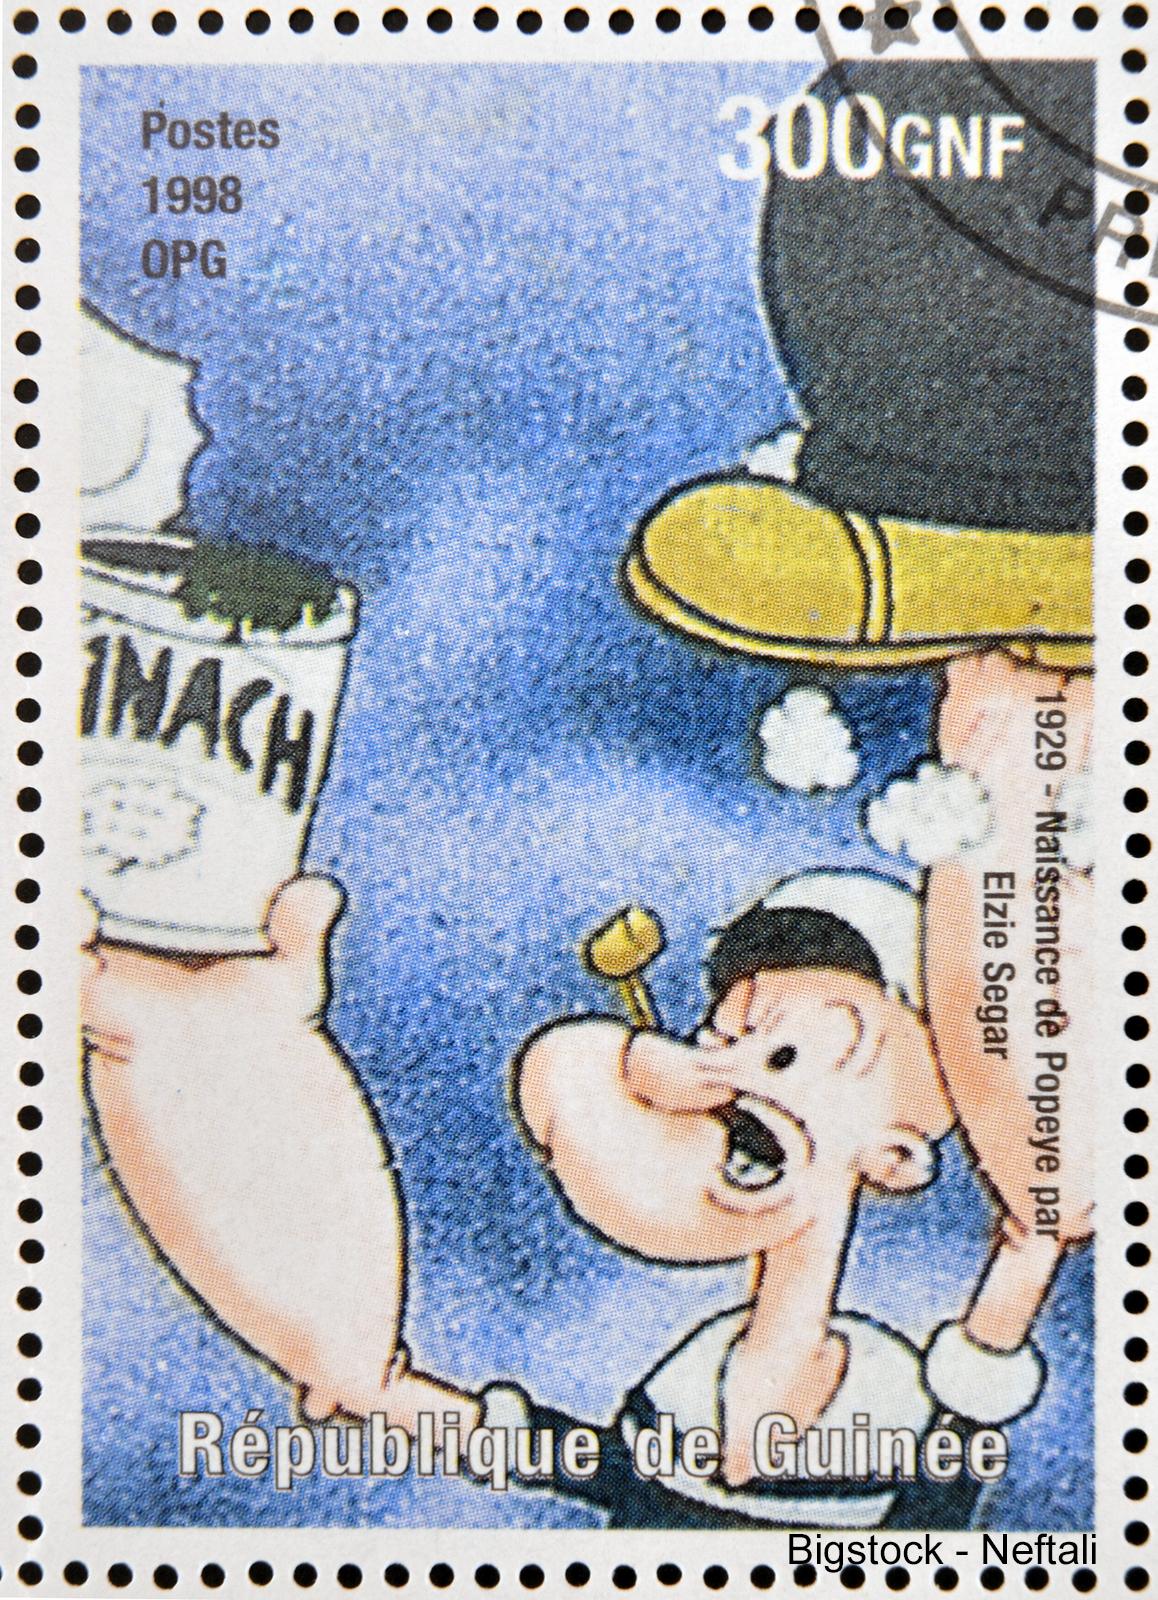 stamp printed in Republic of Guinea commemorates the birth of Po